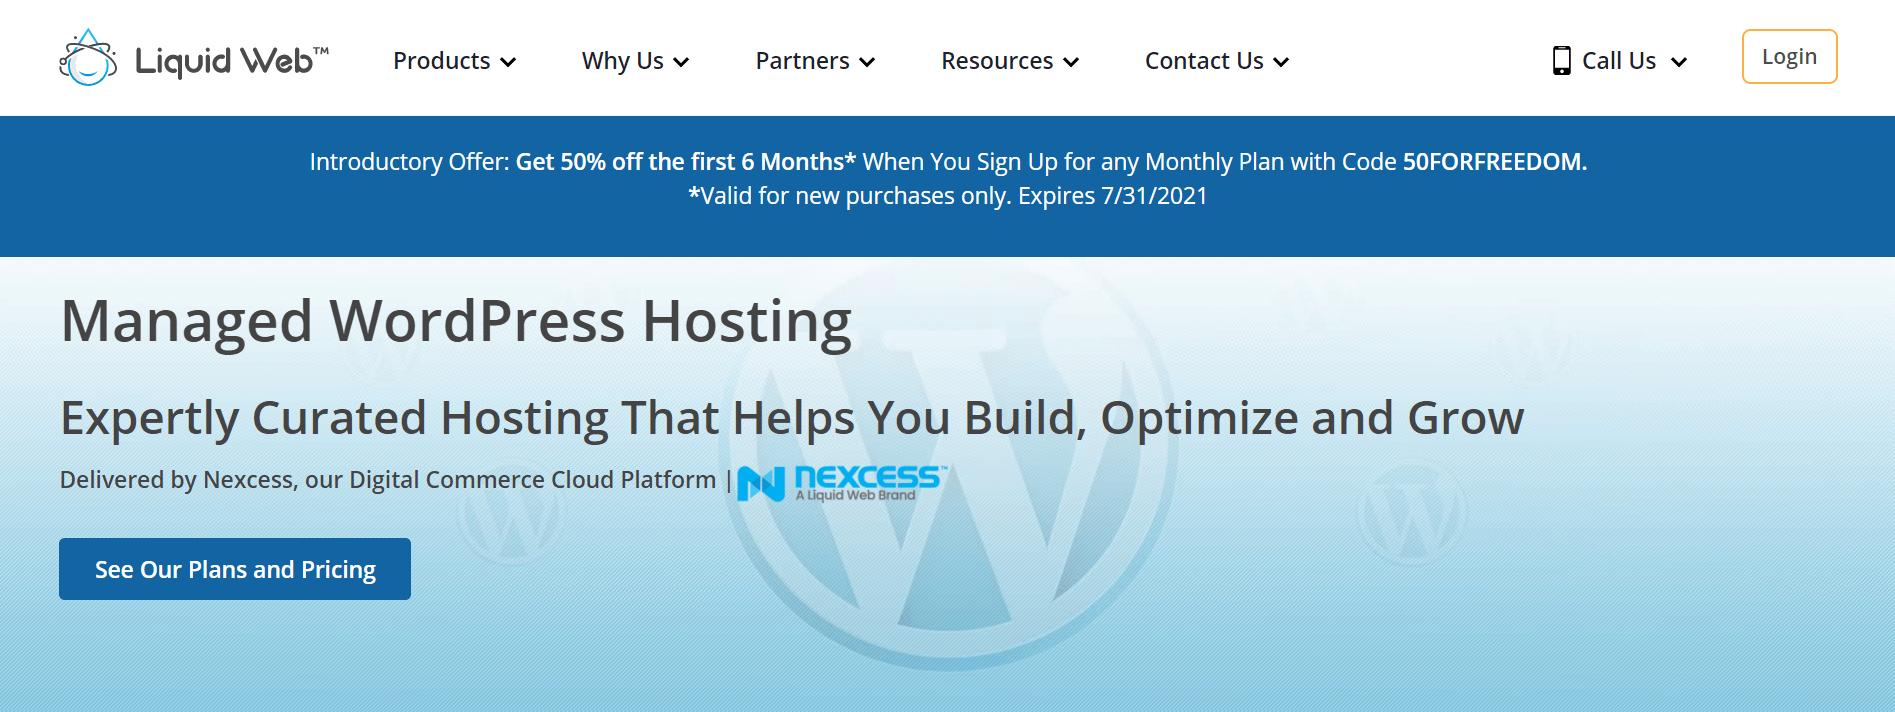 liquid web wordpress hosting